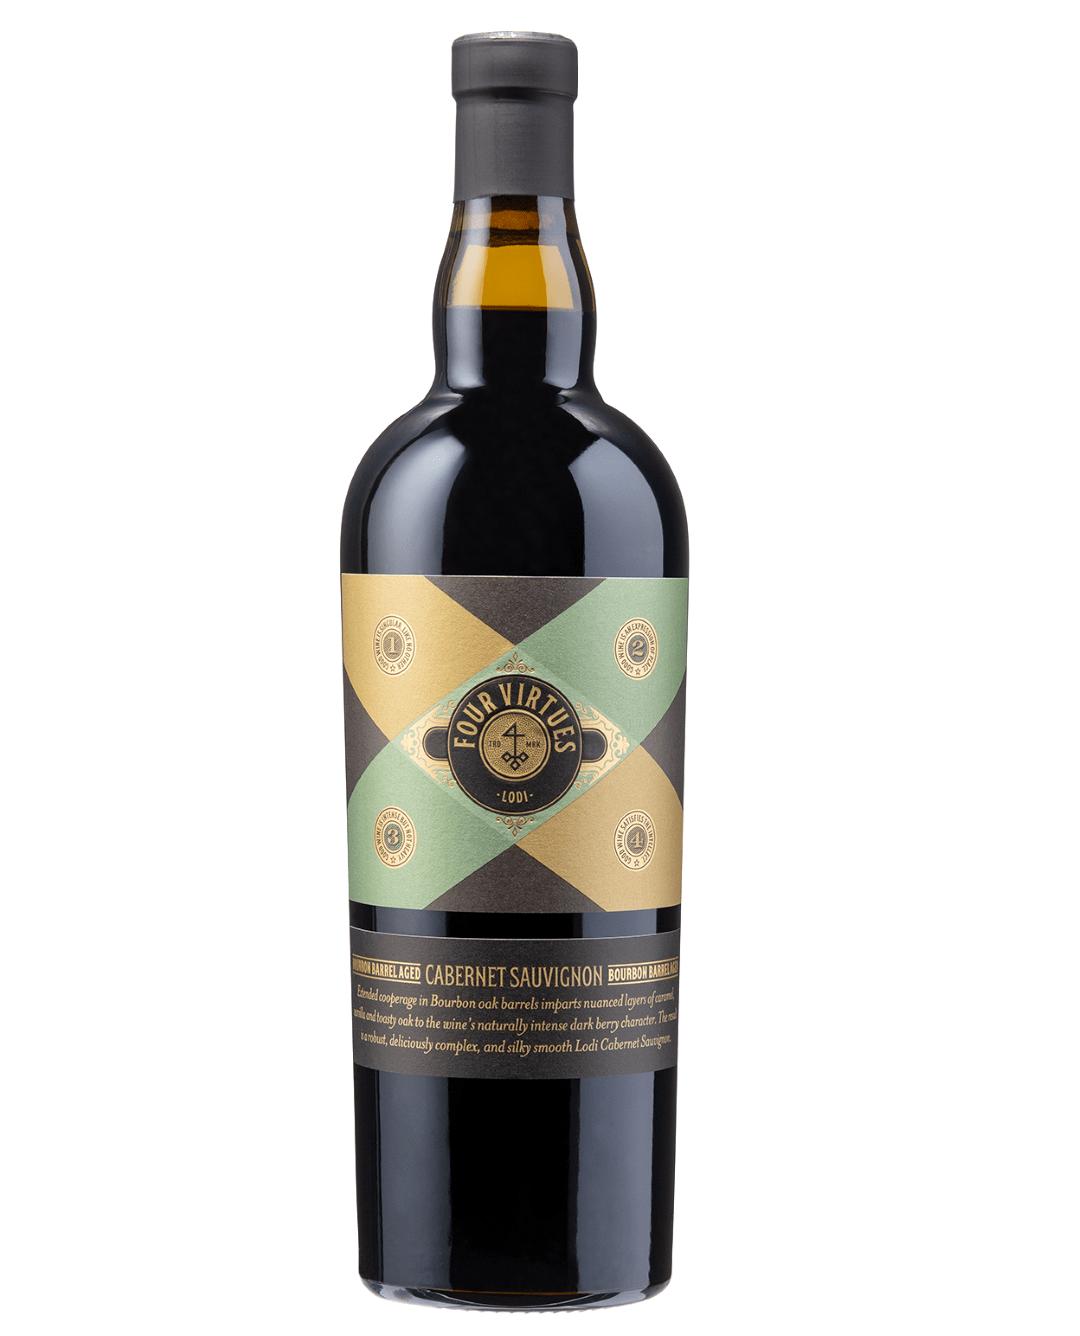 2016 Four Virtues Cabernet Sauvignon Lodi Bourbon Barrel Aged